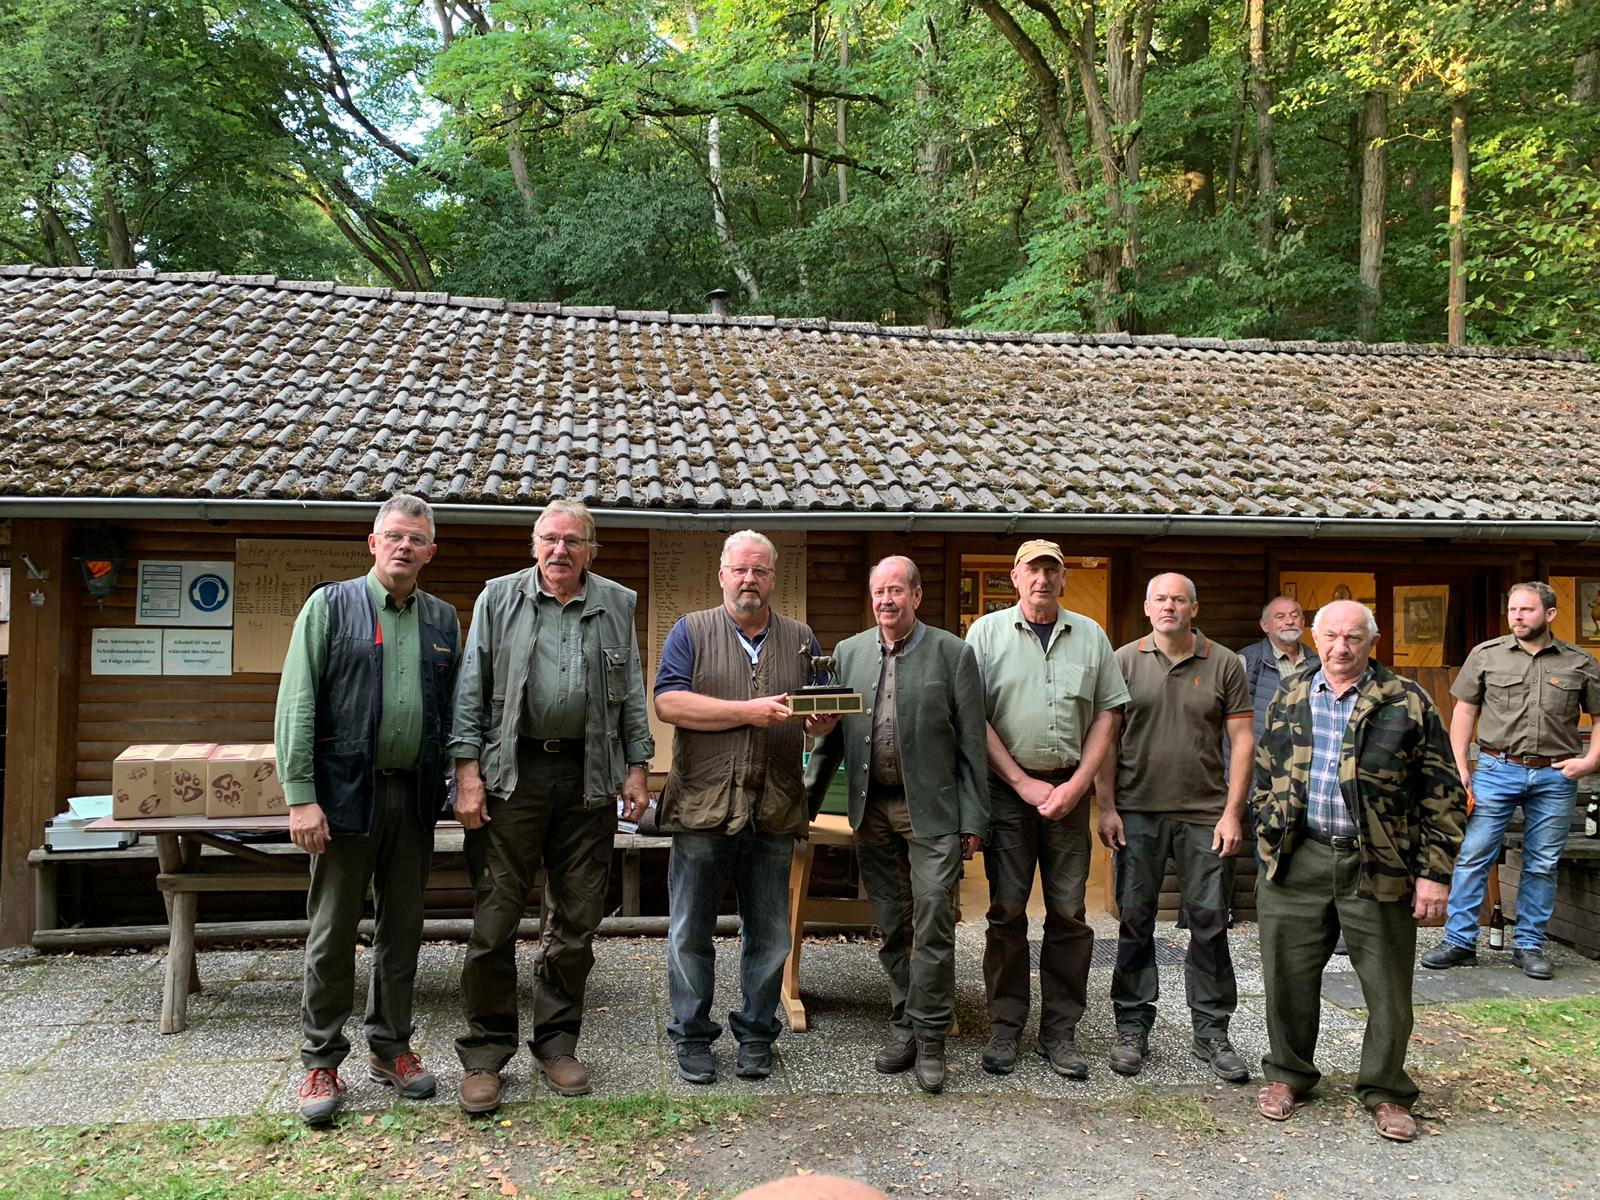 Die Hegegemeinschaft Melsungen/Fuldatal erringt den Hegegemeinschaftspokal